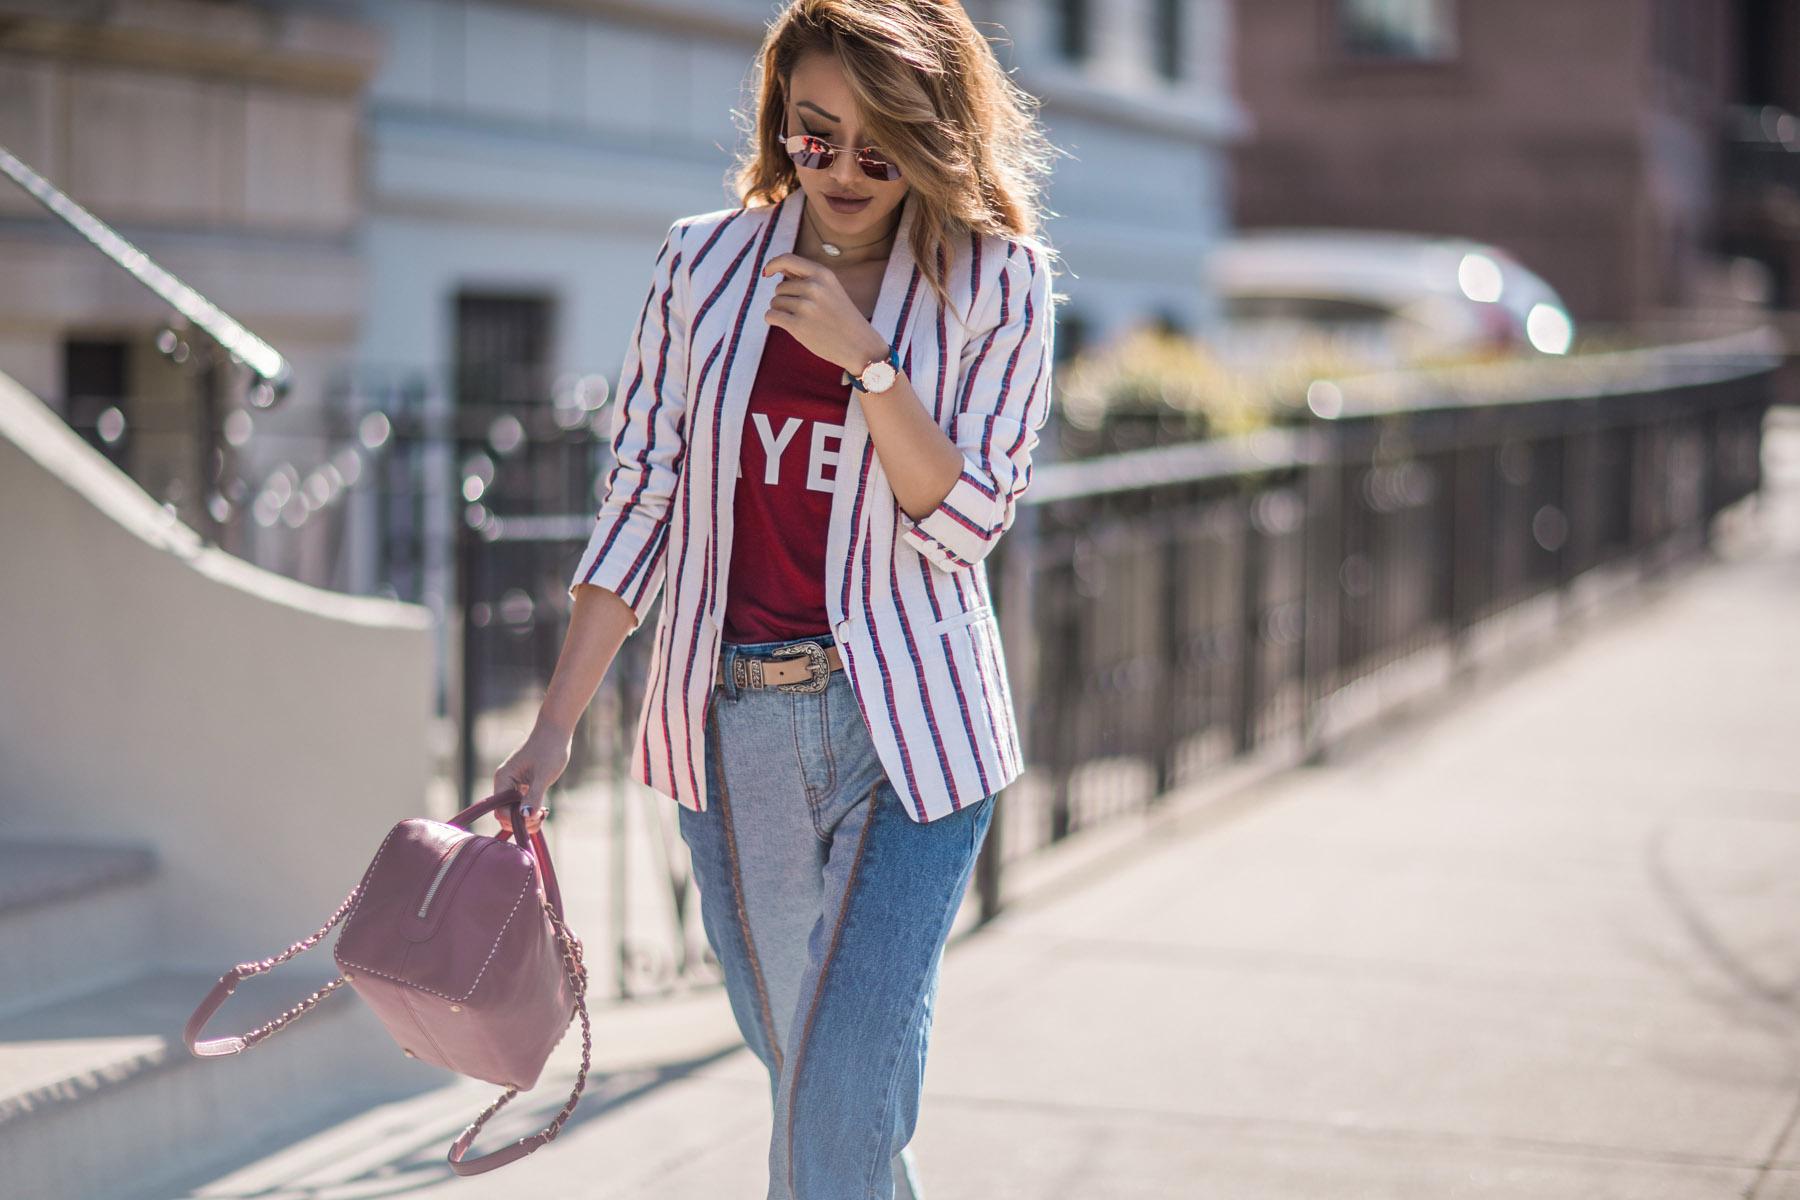 Spring Transitional Jackets - Stripe Blazer and Cluse Minuit Model Rose Gold Watch // NotJessFashion.com